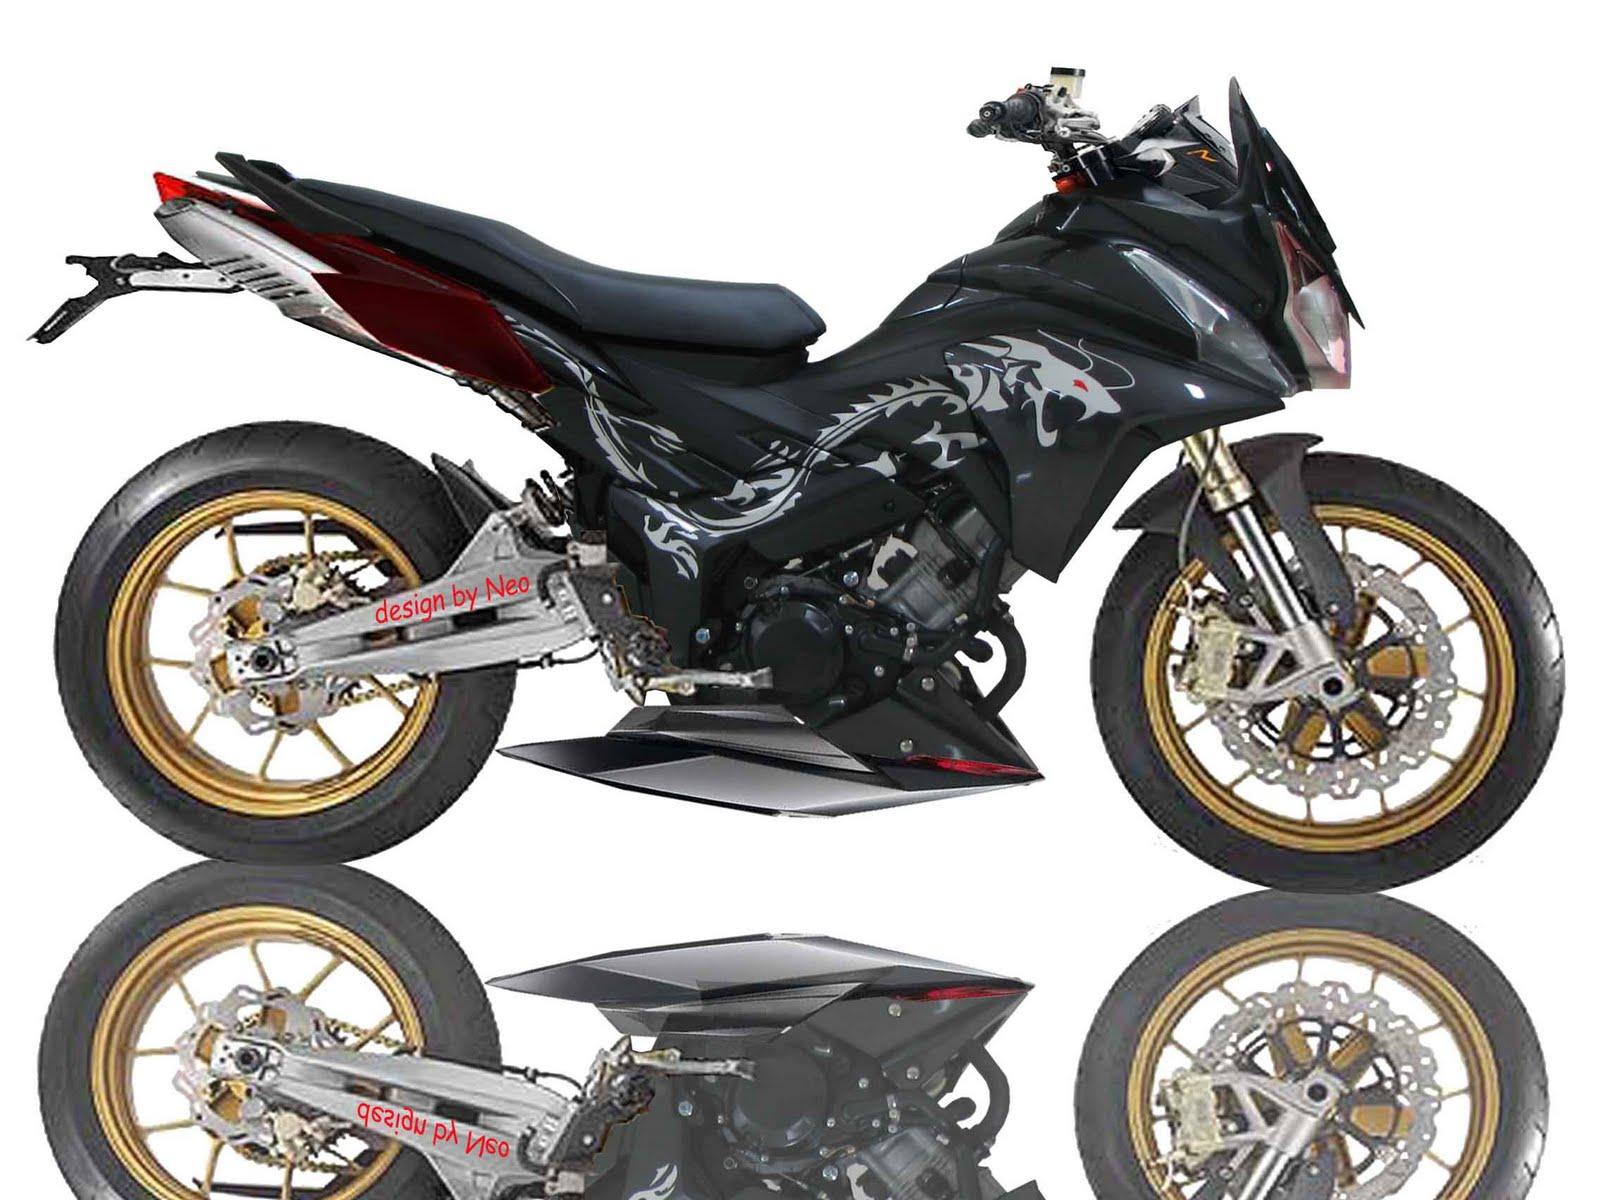 Gallery Automotive: Gambar Modivikasi Motor CS1 Dragon